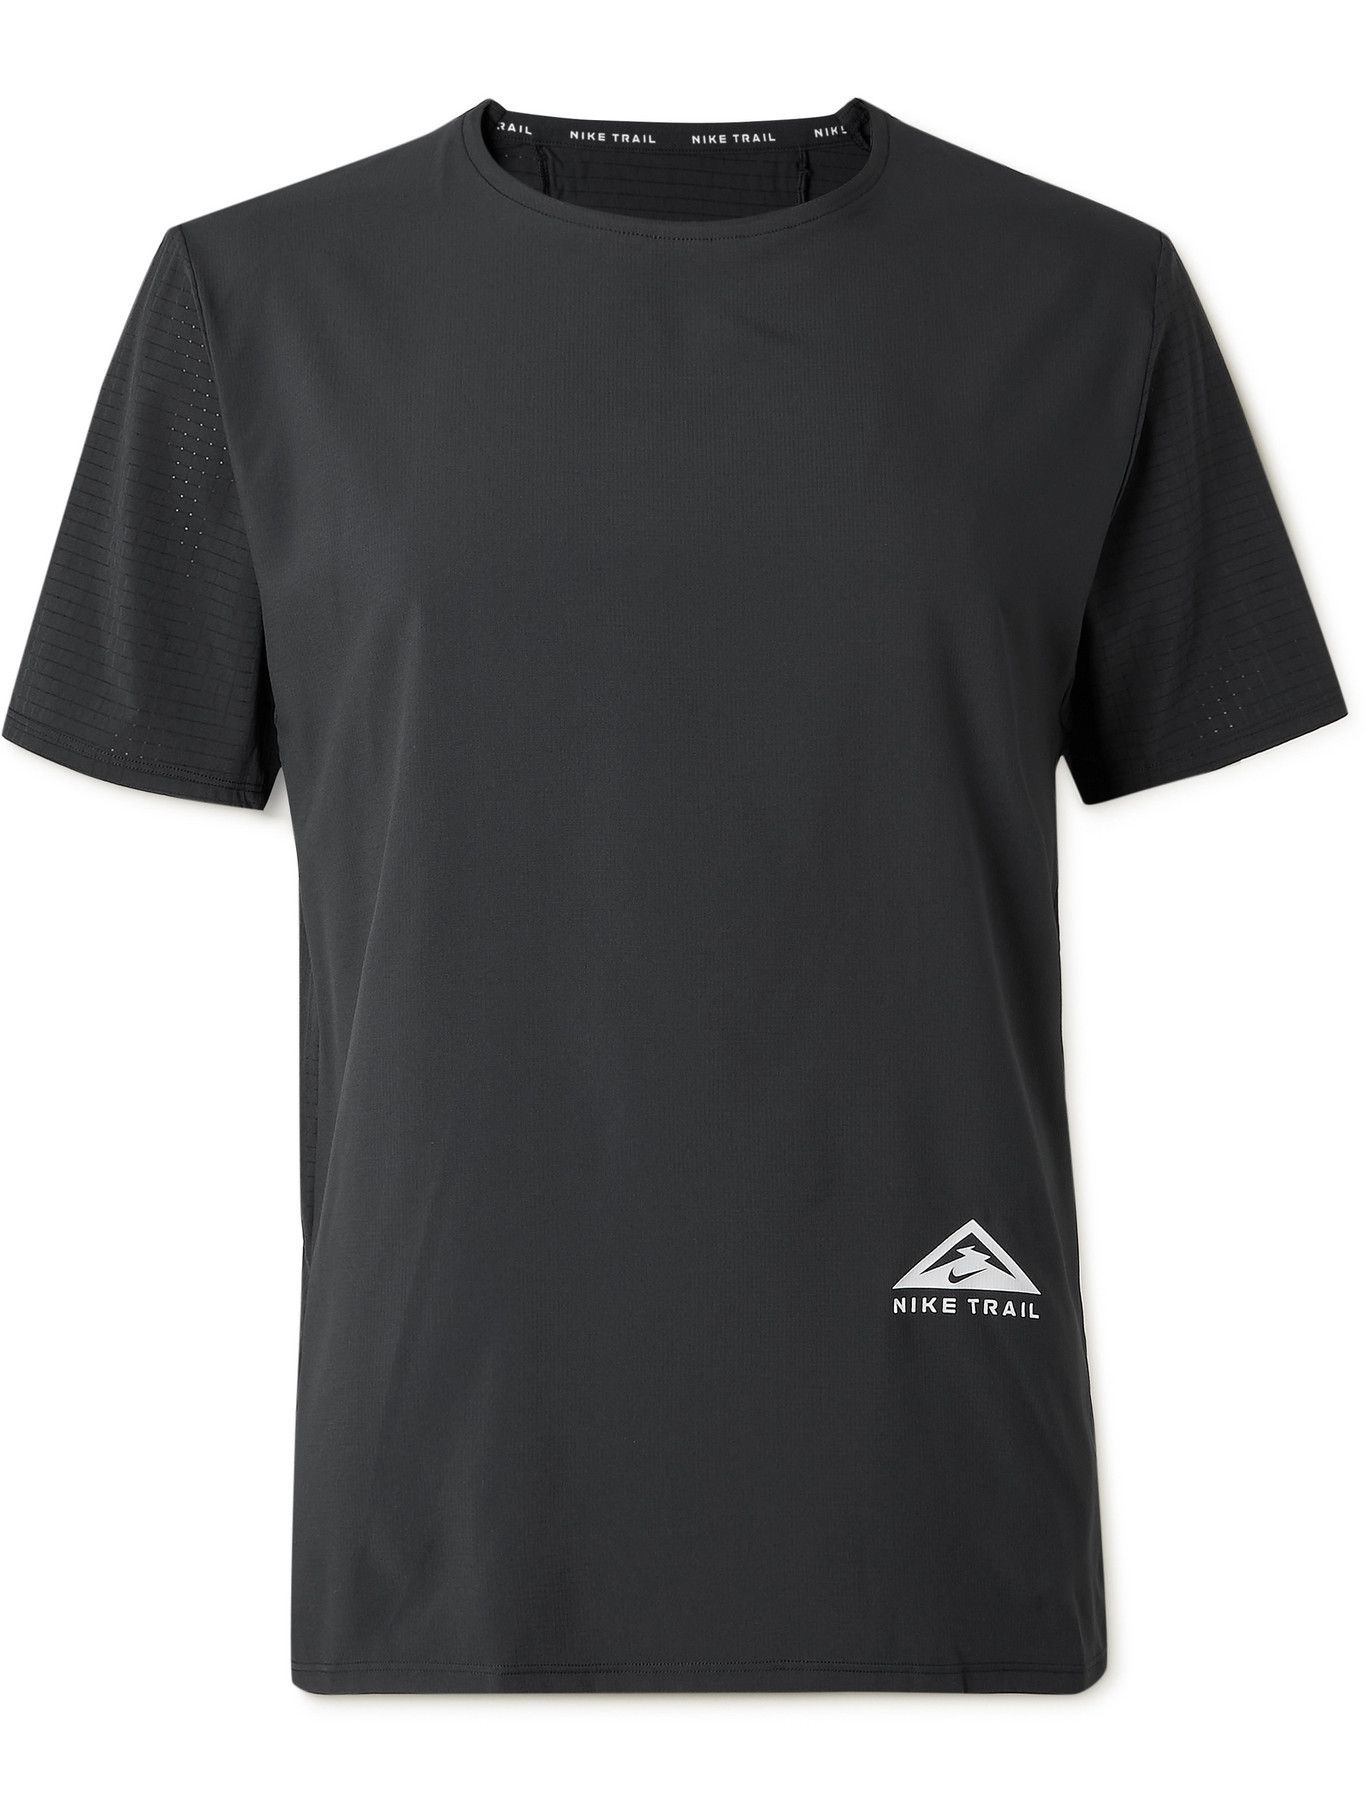 NIKE RUNNING - Rise 365 Logo-Print Dri-FIT Ripstop T-Shirt - Black